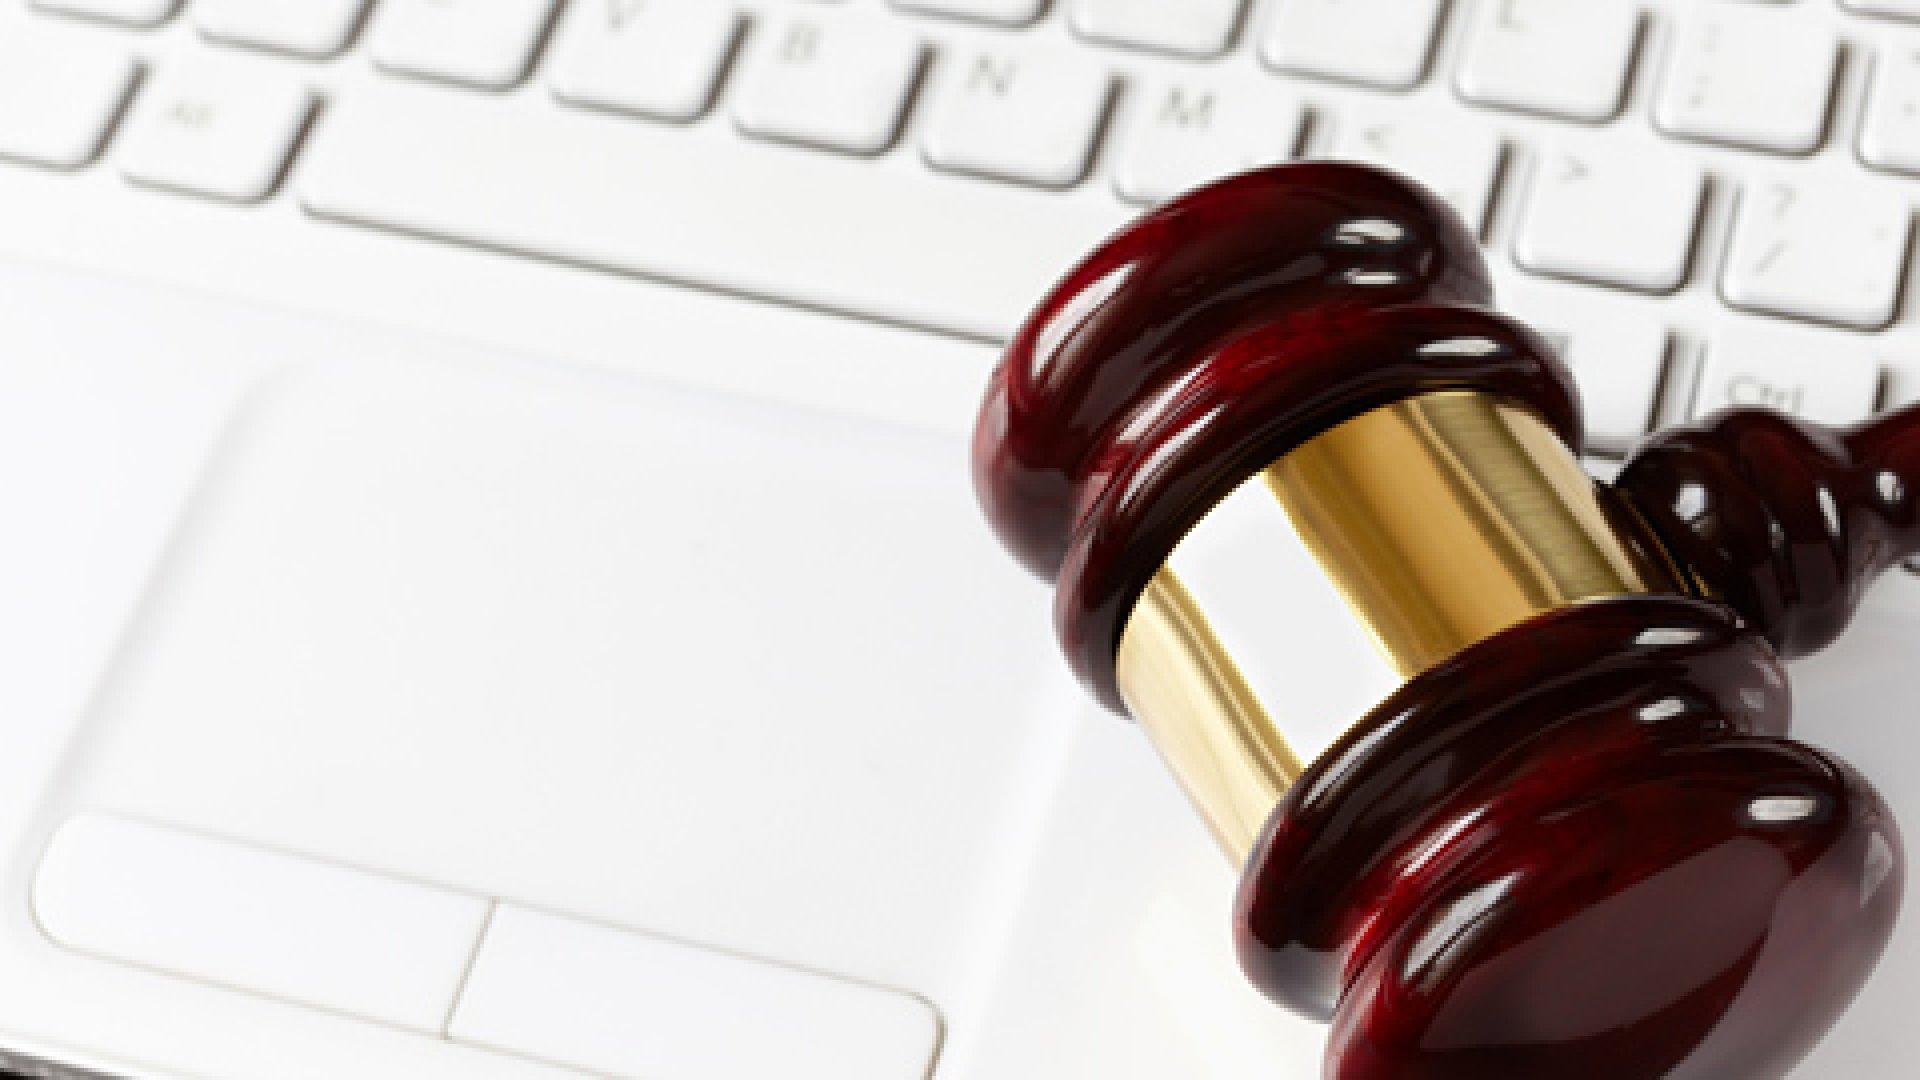 Two Cases: Consumer Privacy Violators Get Slammed